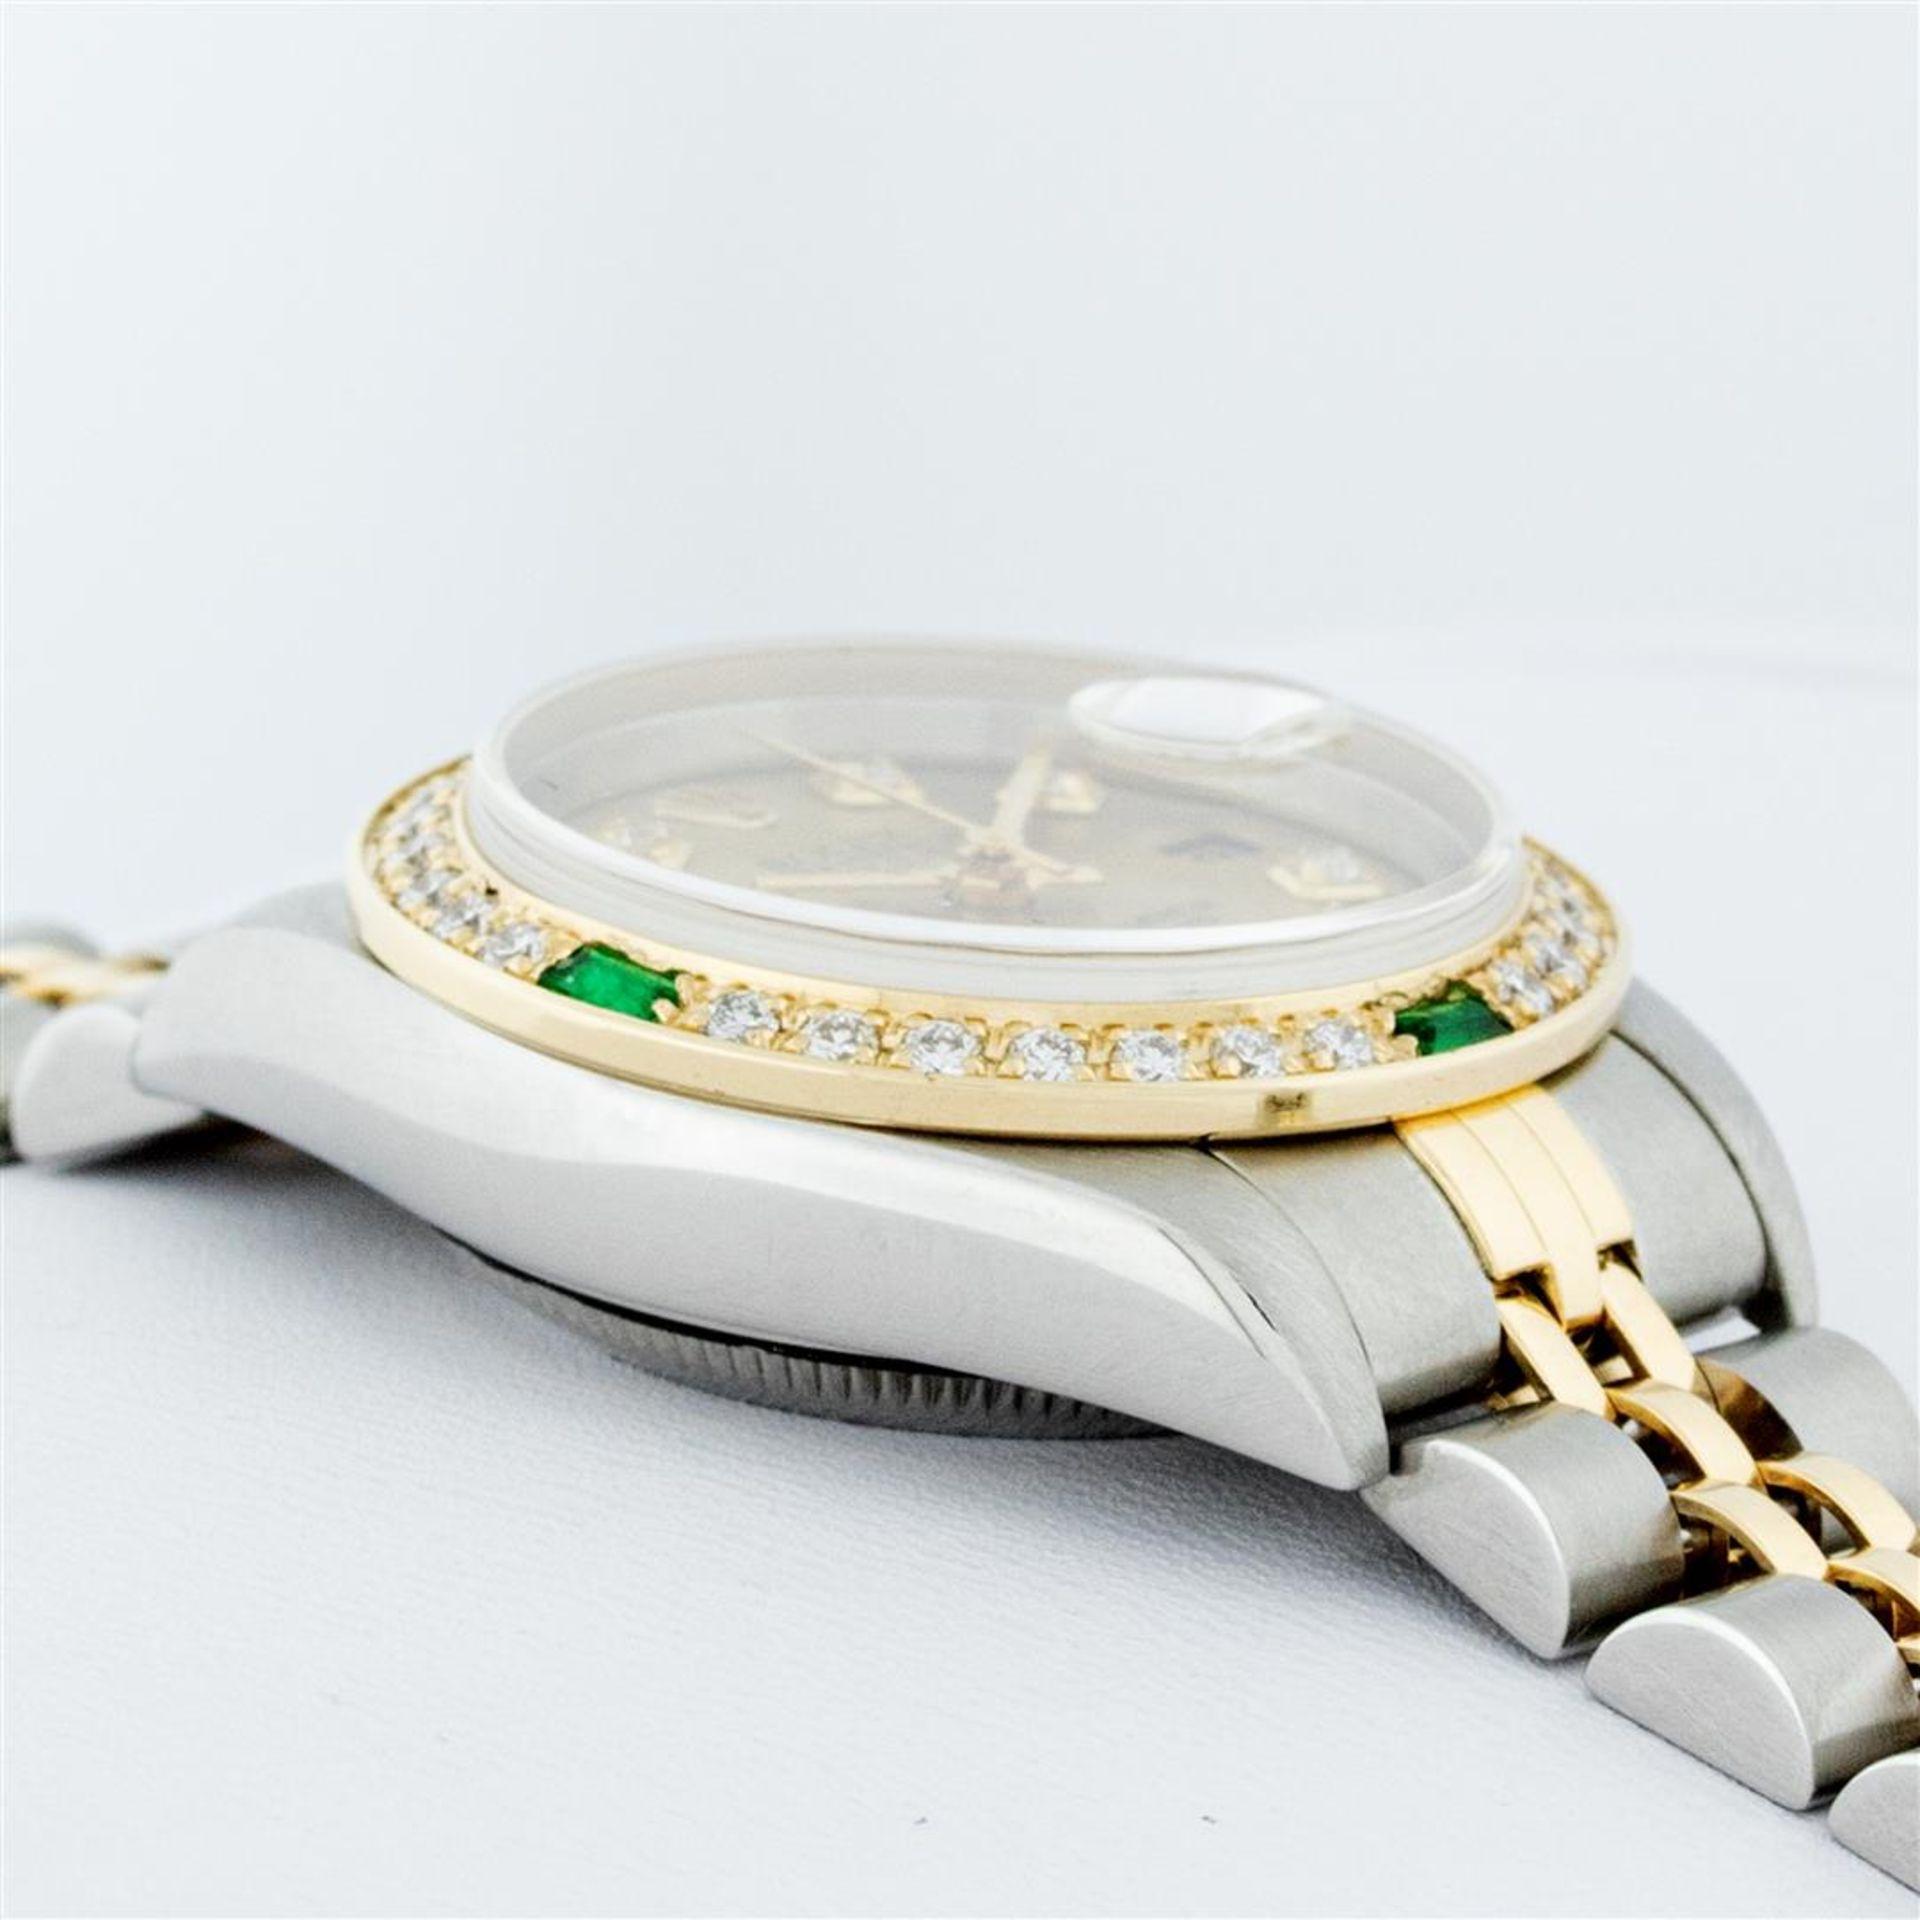 Rolex Ladies 2 Tone 18K Quickset Champagne Diamond & Emerald Datejust Wristwatch - Image 8 of 9